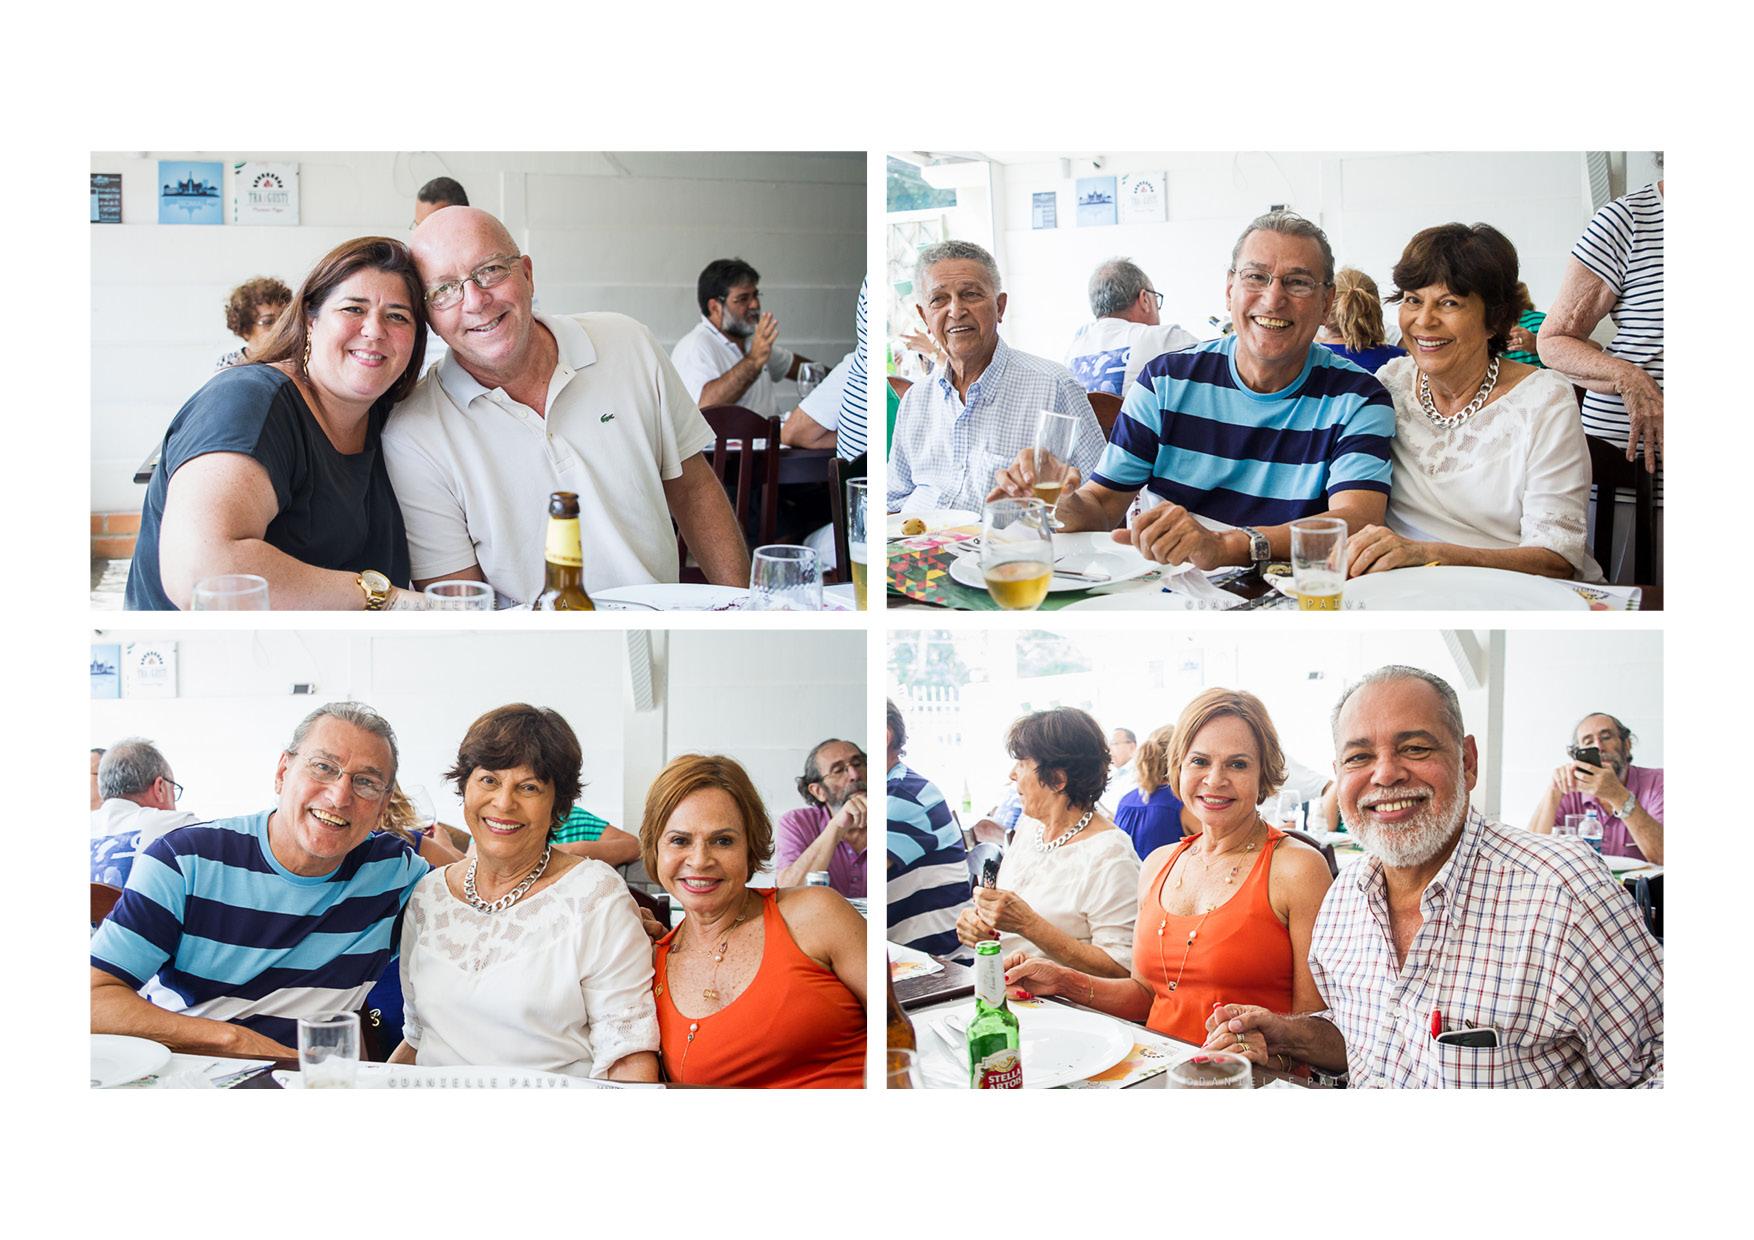 festa-niteroi-restaurante-eventos-tra-i-gusti-2